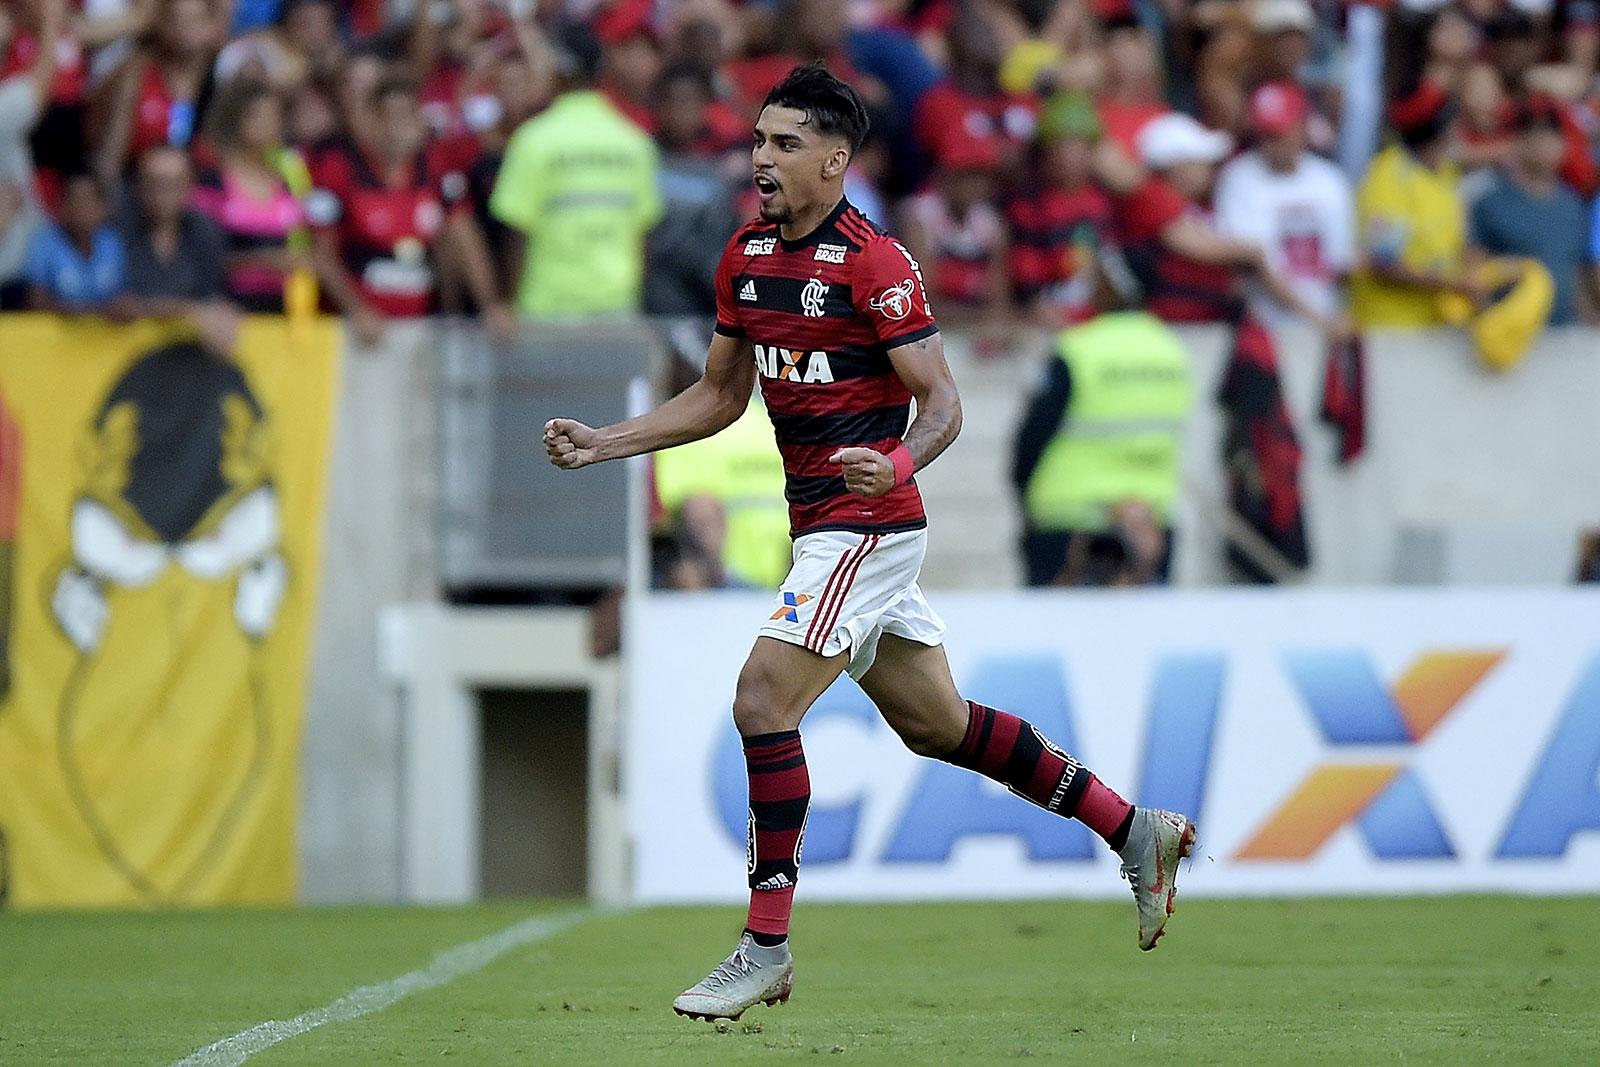 Lucas Paquetá celebrating during Flamengo- Clube Atlético Mineiro at the Maracanã on September 23, 2018. (Photo by Alexandre Loureiro/Getty Images)